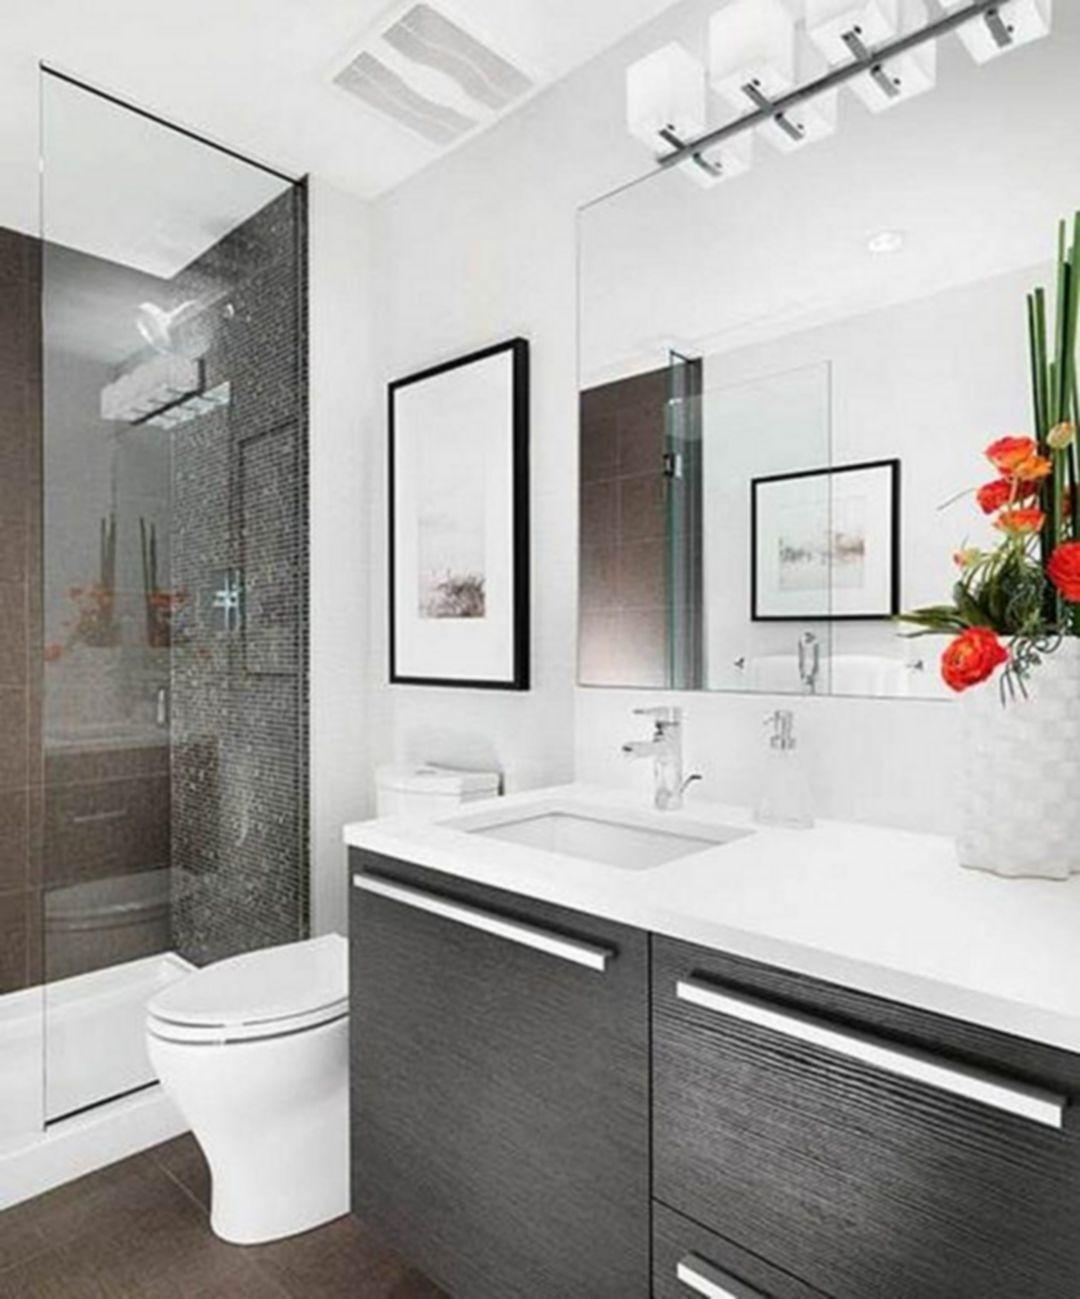 Elegant Bathroom Remodels: 20 Elegant Minimalist Bathroom Design Ideas You Have To